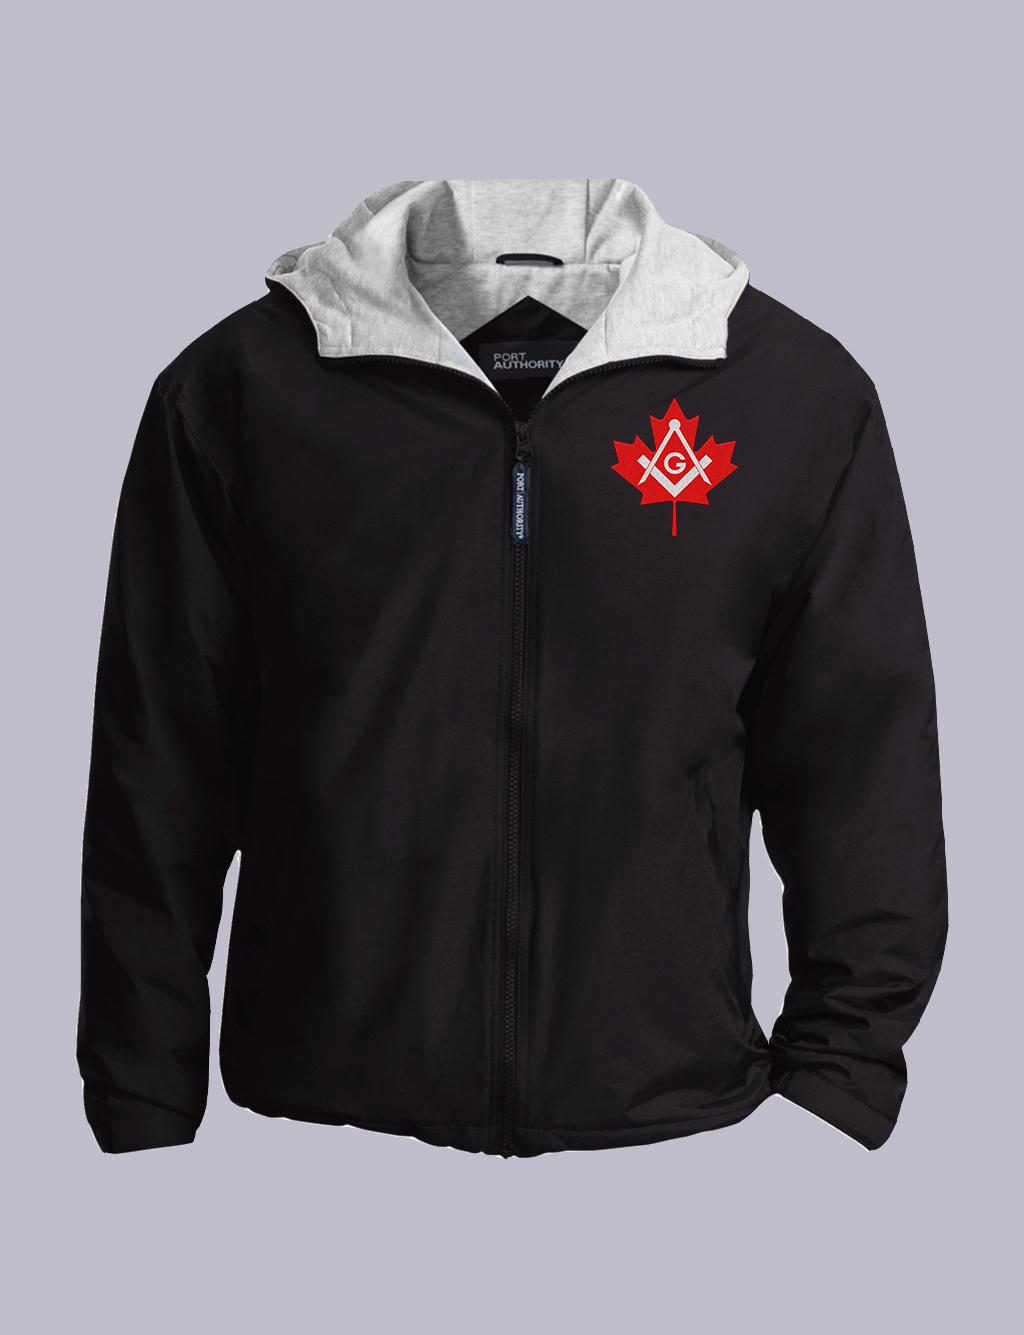 Canadian Freemasons Embroidery Masonic Jacket | MASONIC VIBE